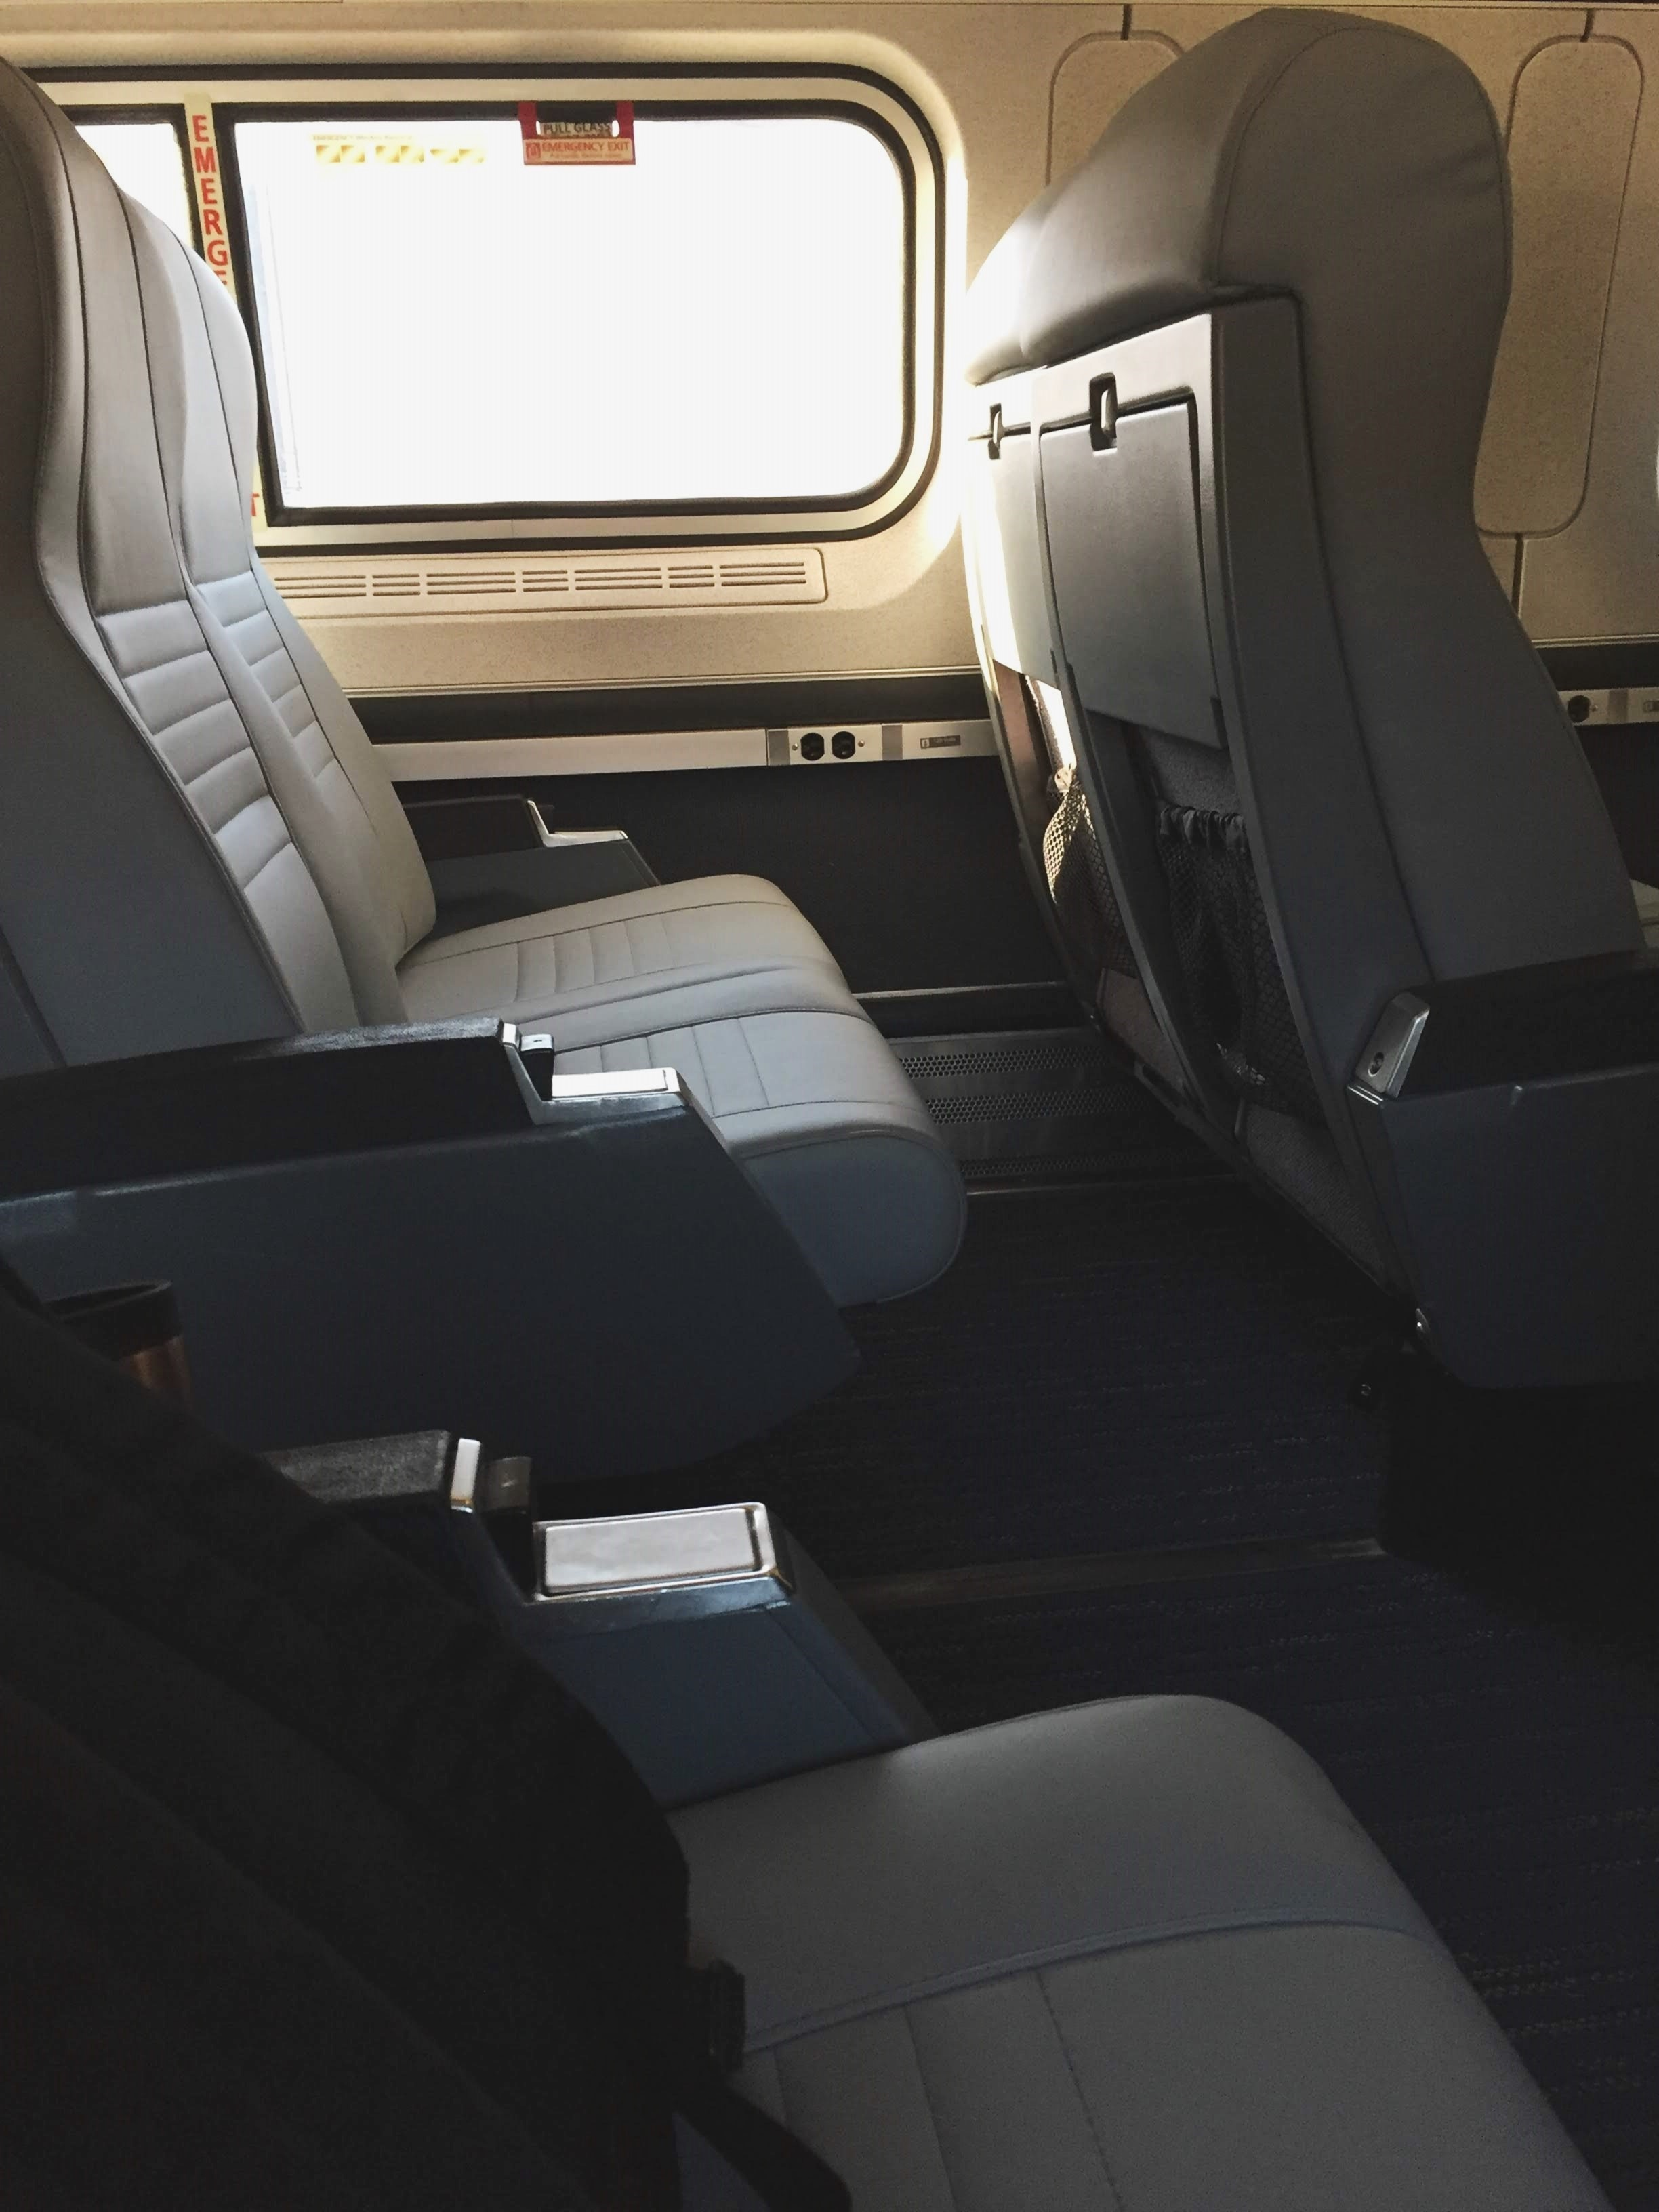 Amtrak Missouri River Runner: Taking the Train from St. Louis to Kansas City #amtrak #traintravel #train